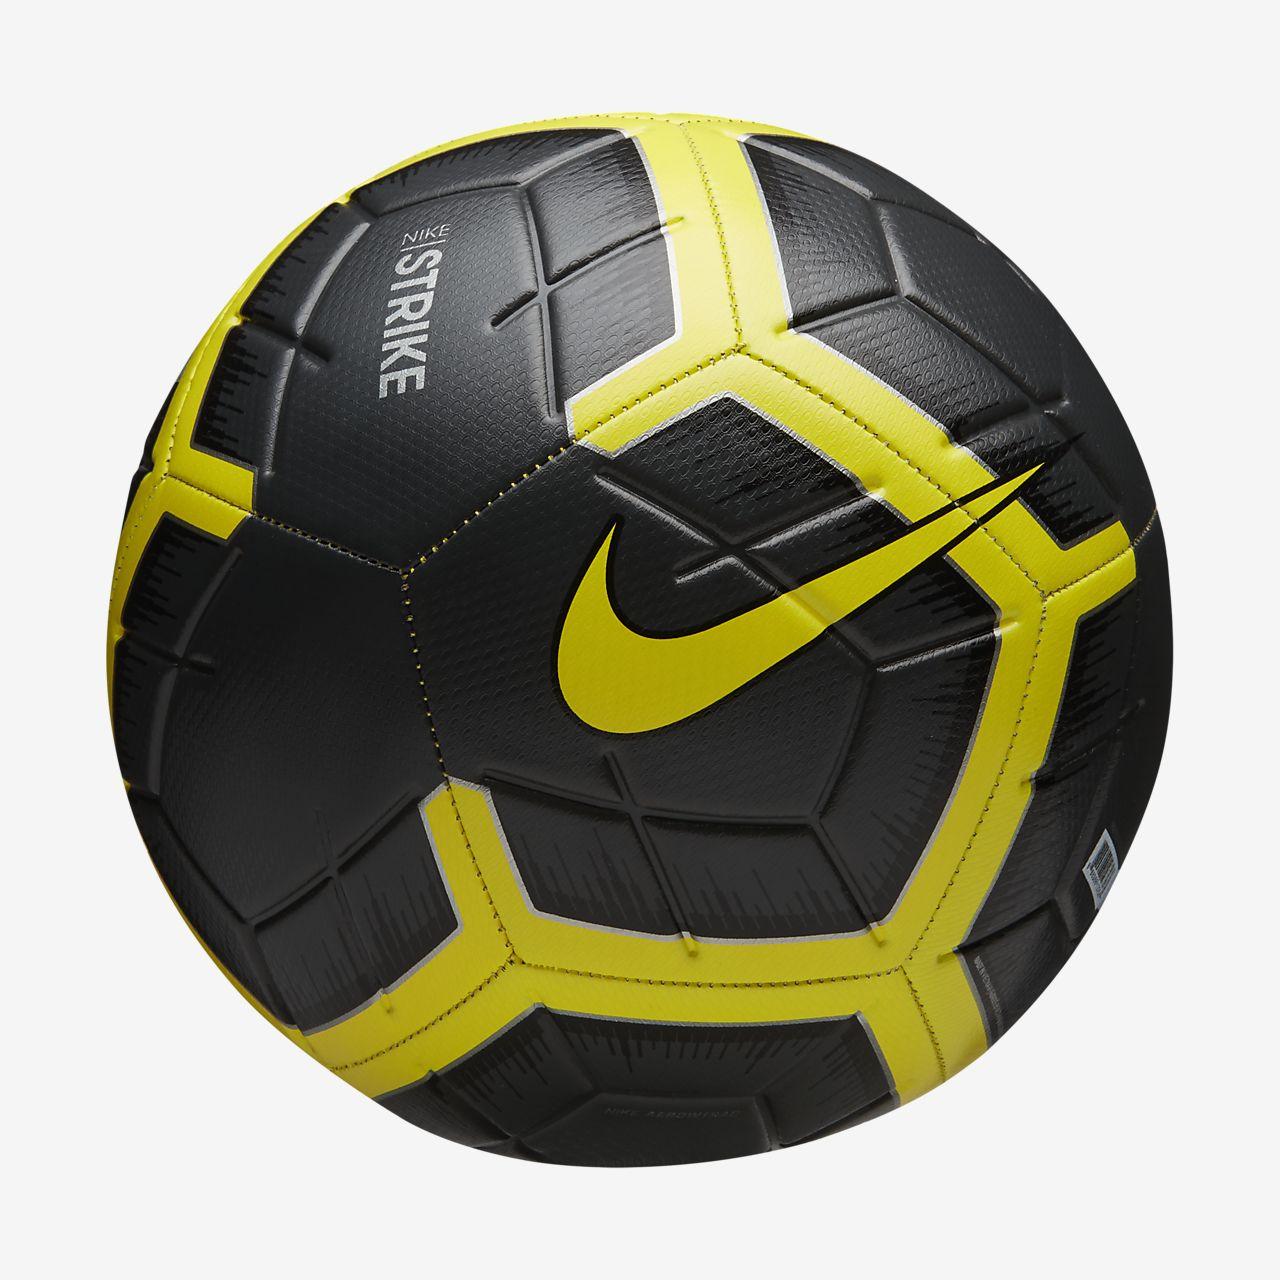 timeless design 2894d c84c5 ... Ballon de football Nike Strike